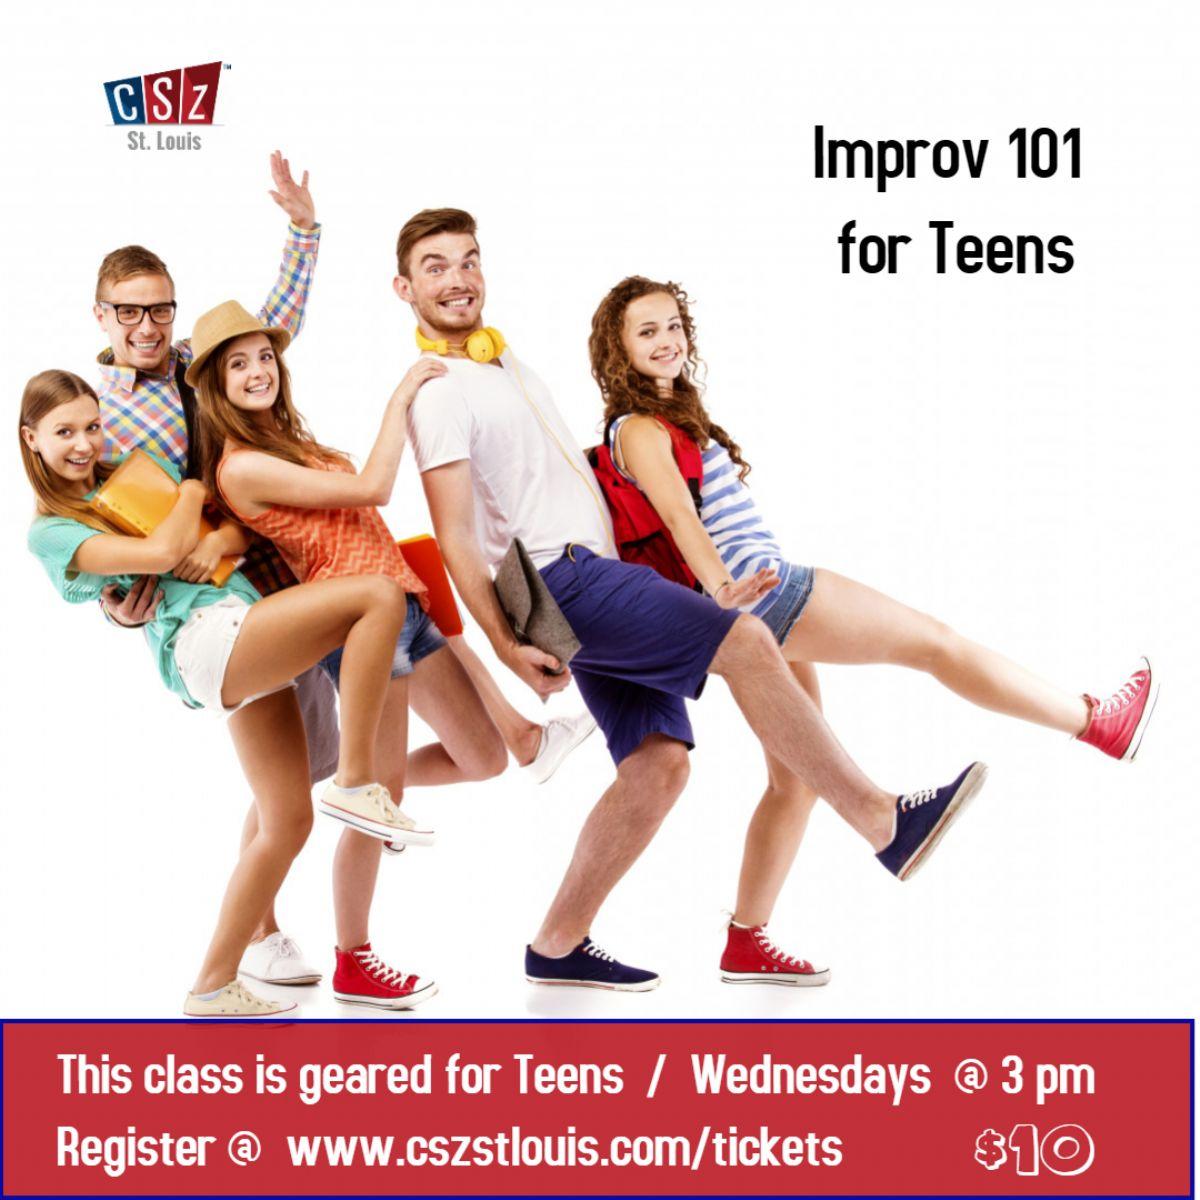 Improv 101 for Teens